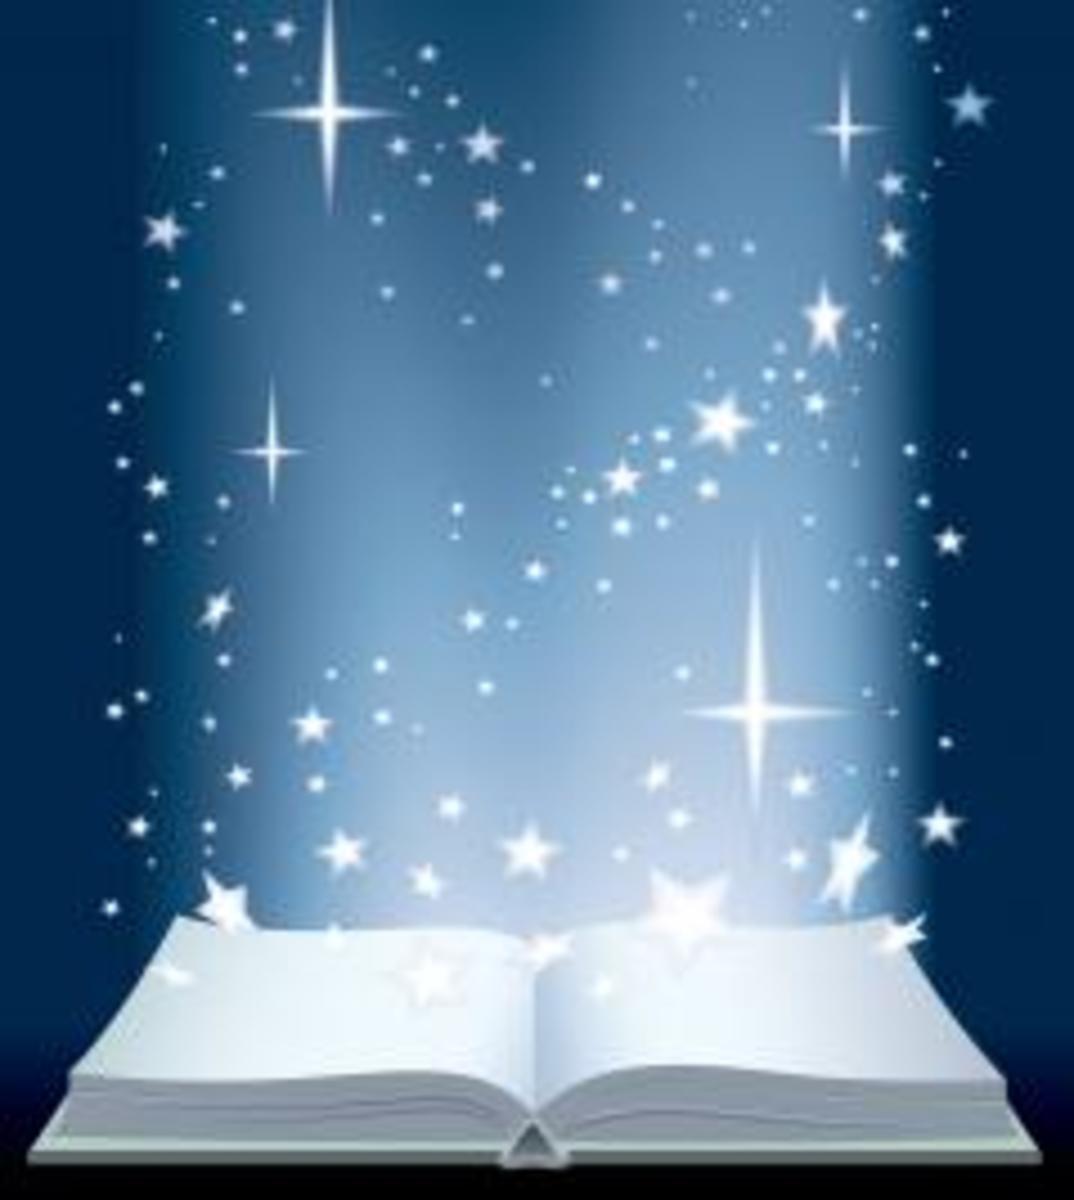 Spiritual healing: Create a healing book full of energy from the source